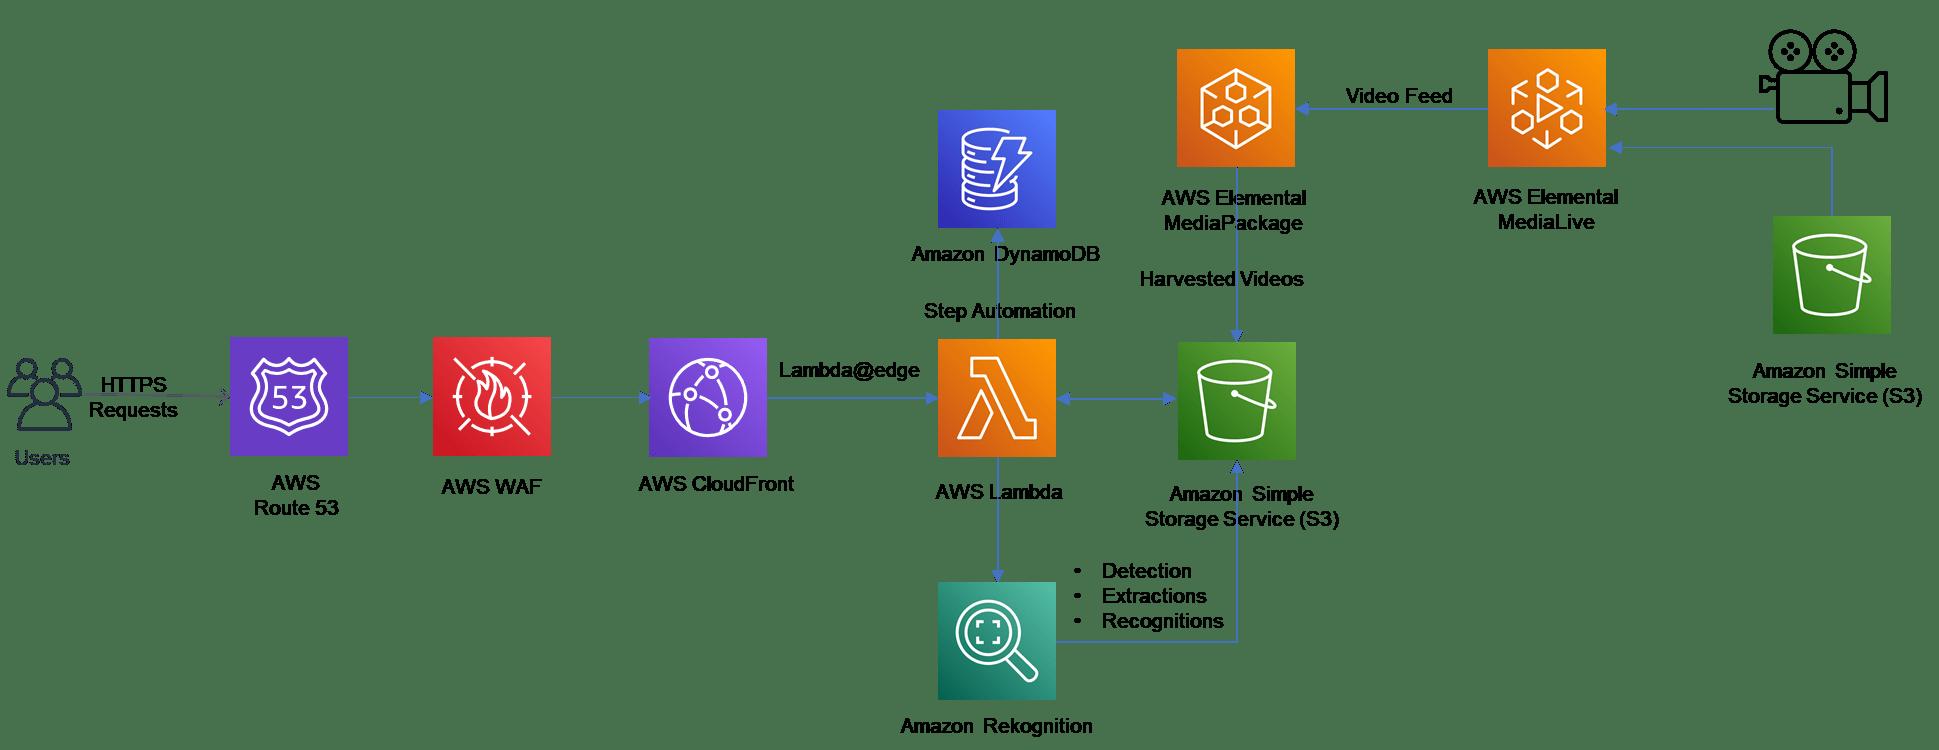 Machine Learning (ML) models